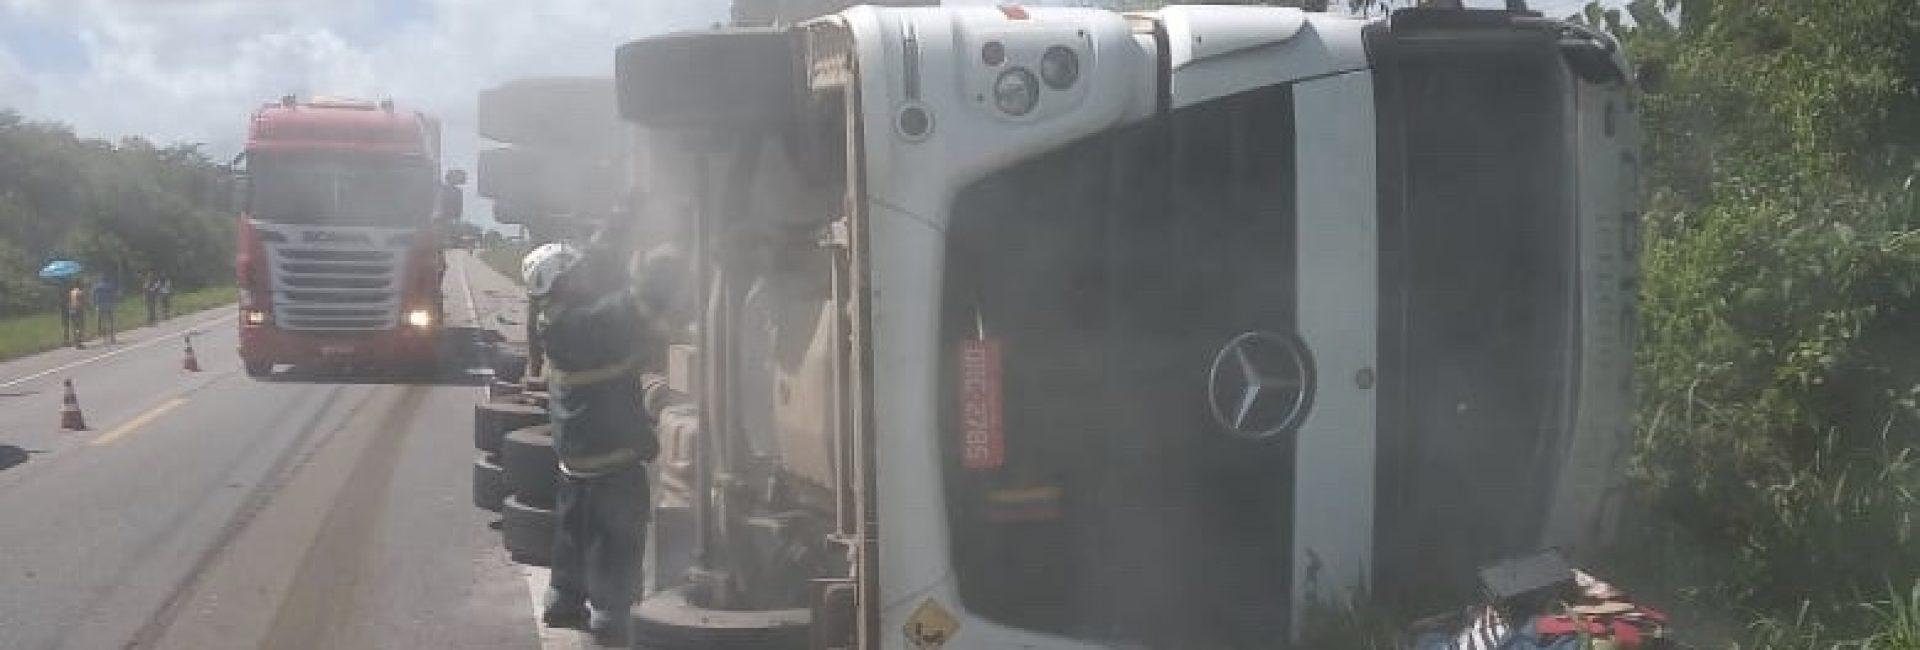 CBMPA realiza resgate em acidente na rodovia BR 316